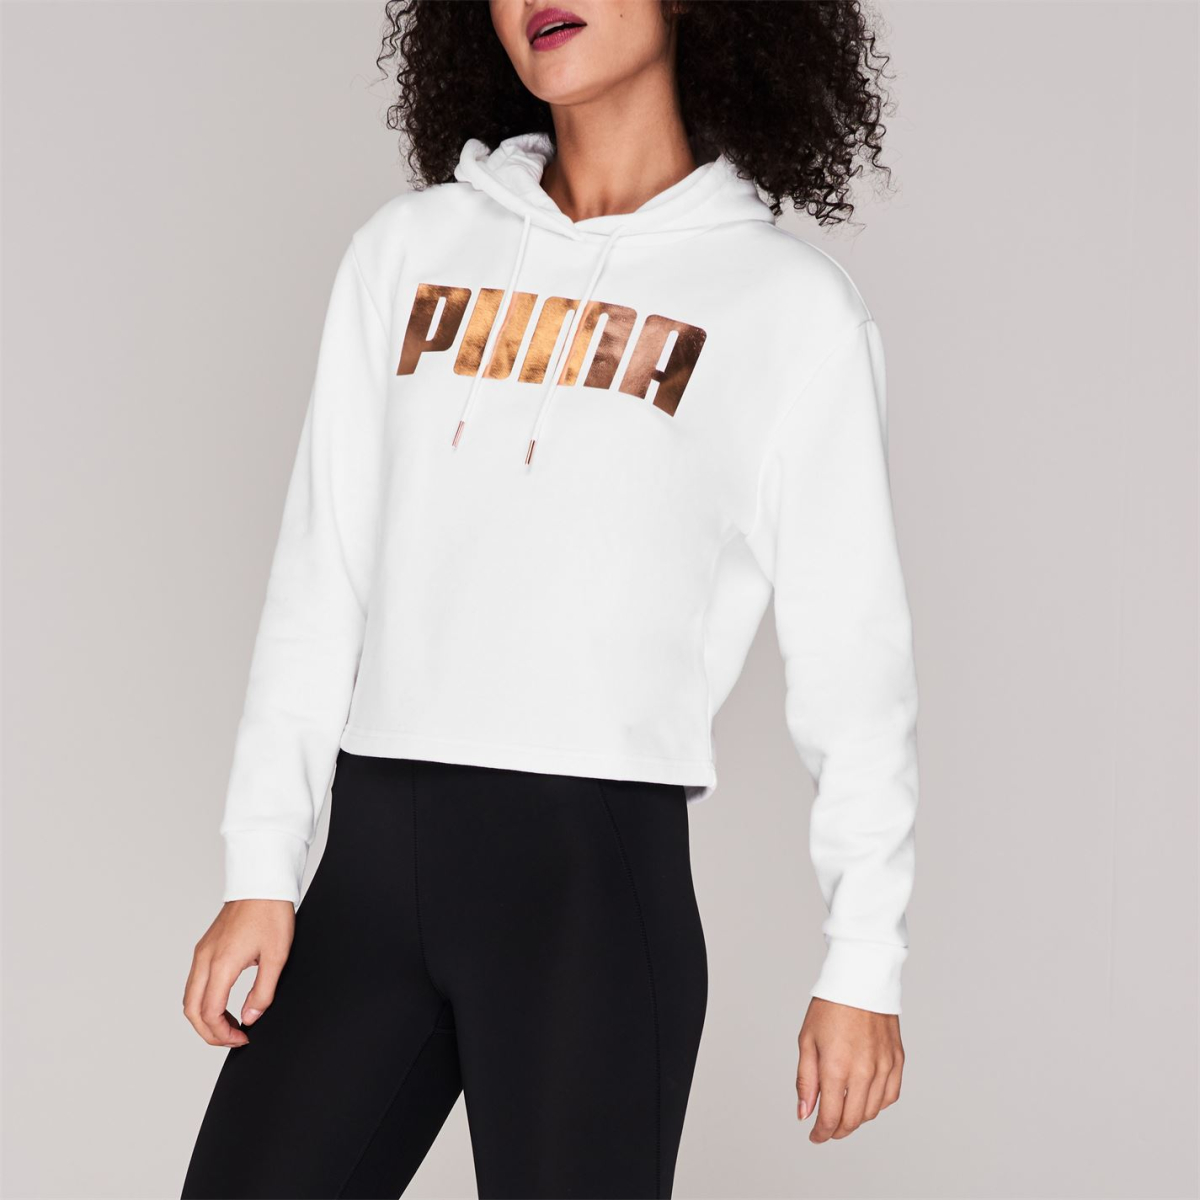 Puma Holiday Kapuzenjacke Jacke Kapuzenpullover Damen Sweatshirt Pullover 0526